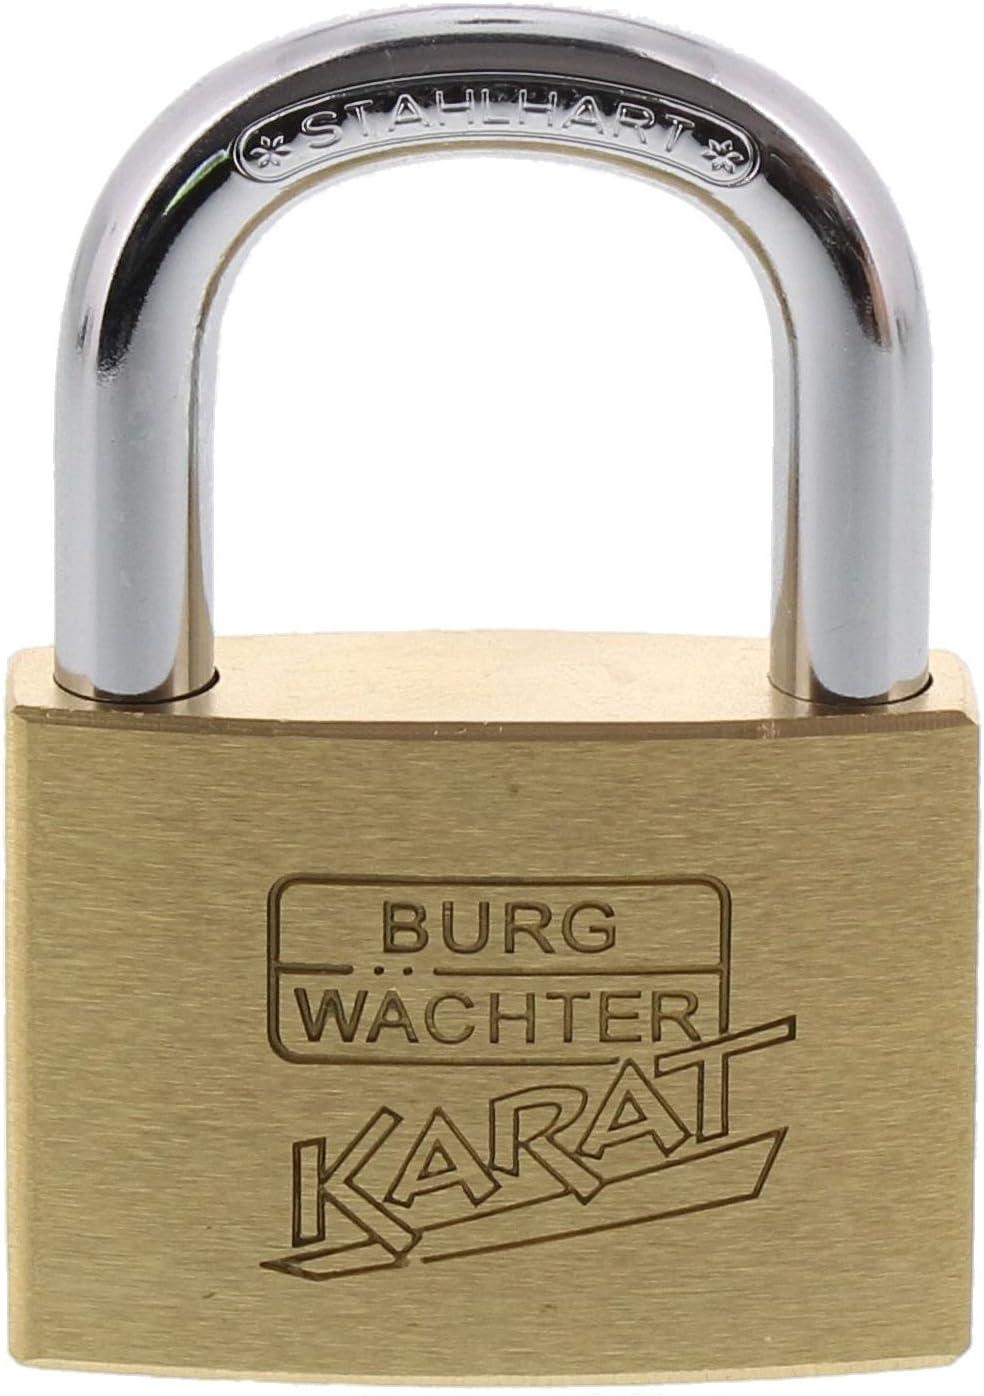 Max 82% OFF Burg-Wächter Cylinder Tucson Mall Padlock 8mm 6Keys Pincers Thickness